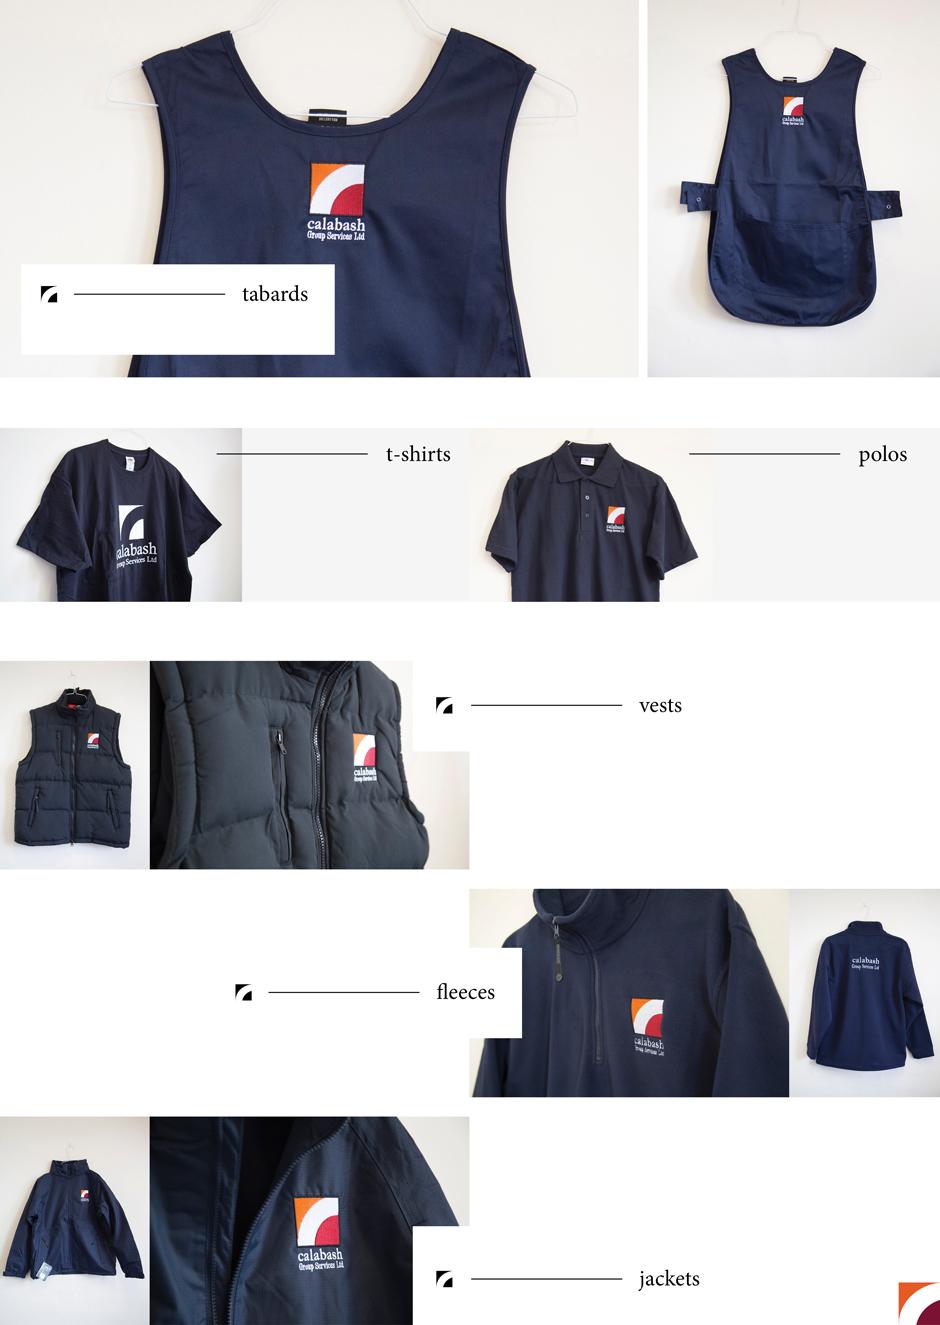 cg-clothing